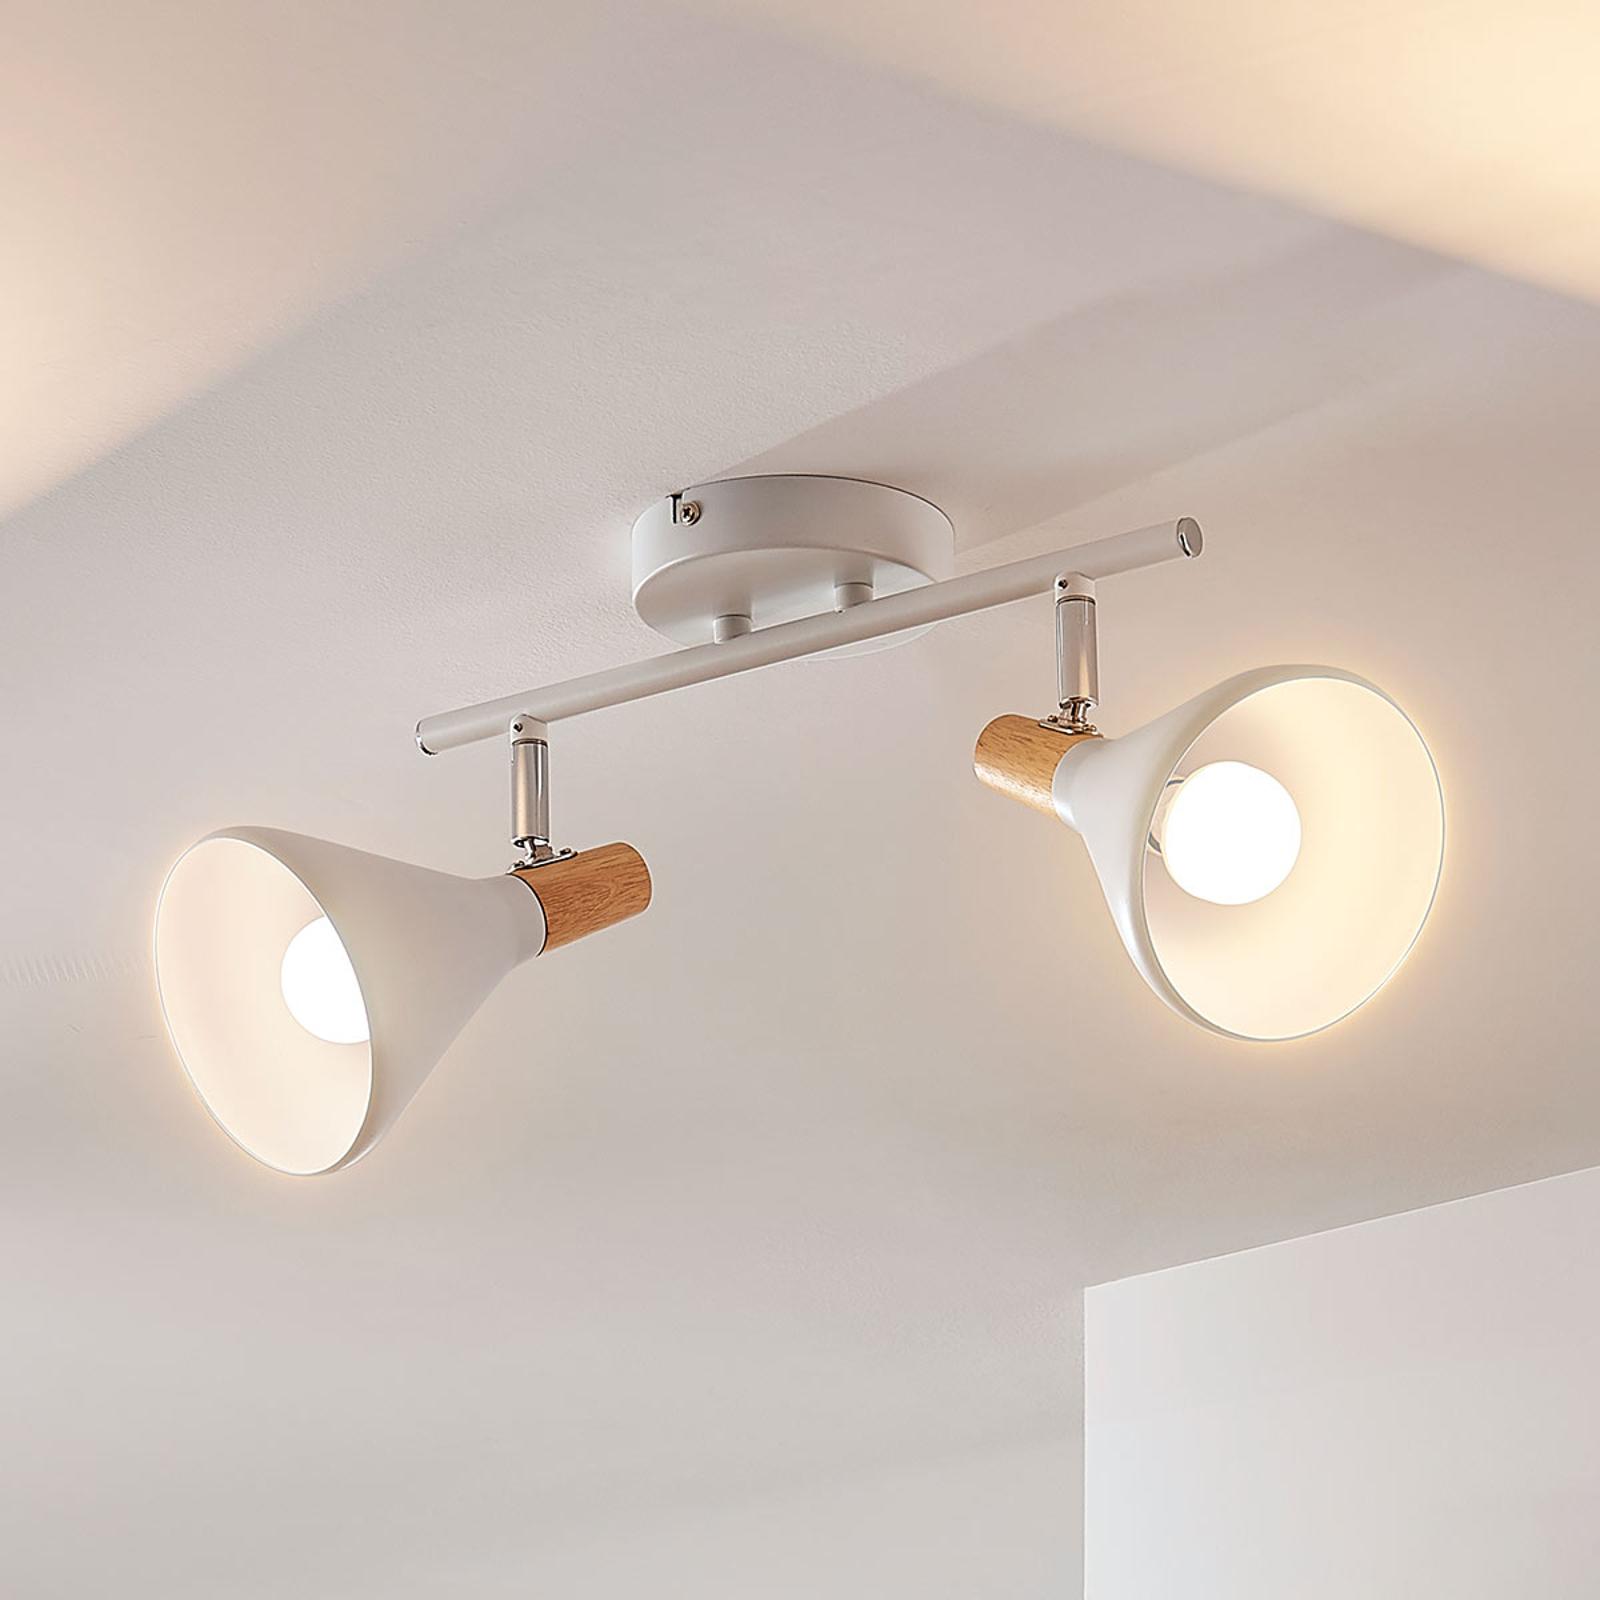 LED loftlampe Arina 2 lyskilder